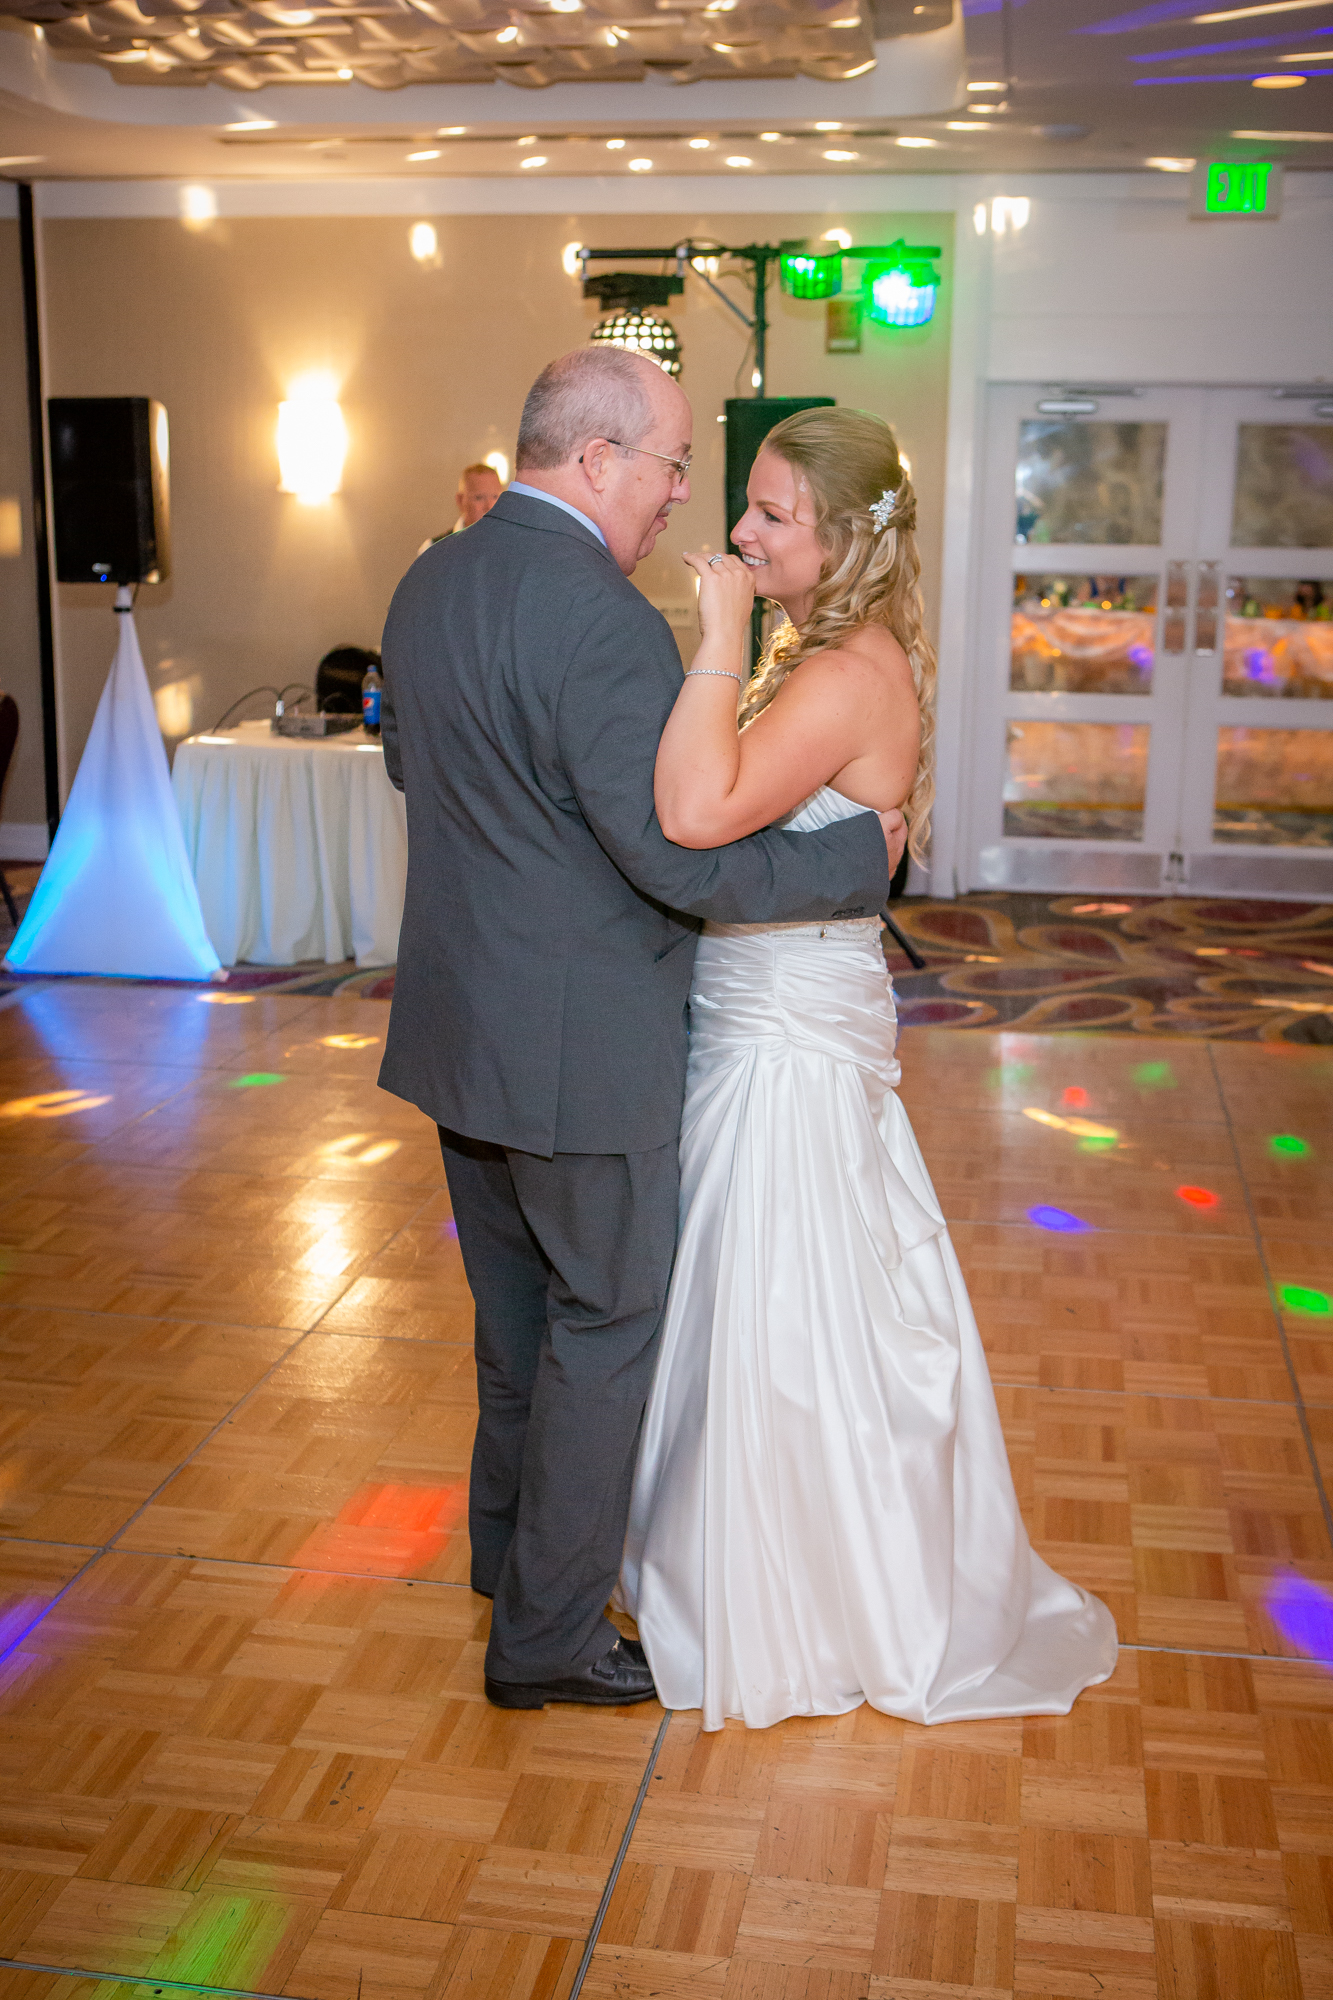 Raddison-Hotel-Corning-NY-Wedding-4427.jpg